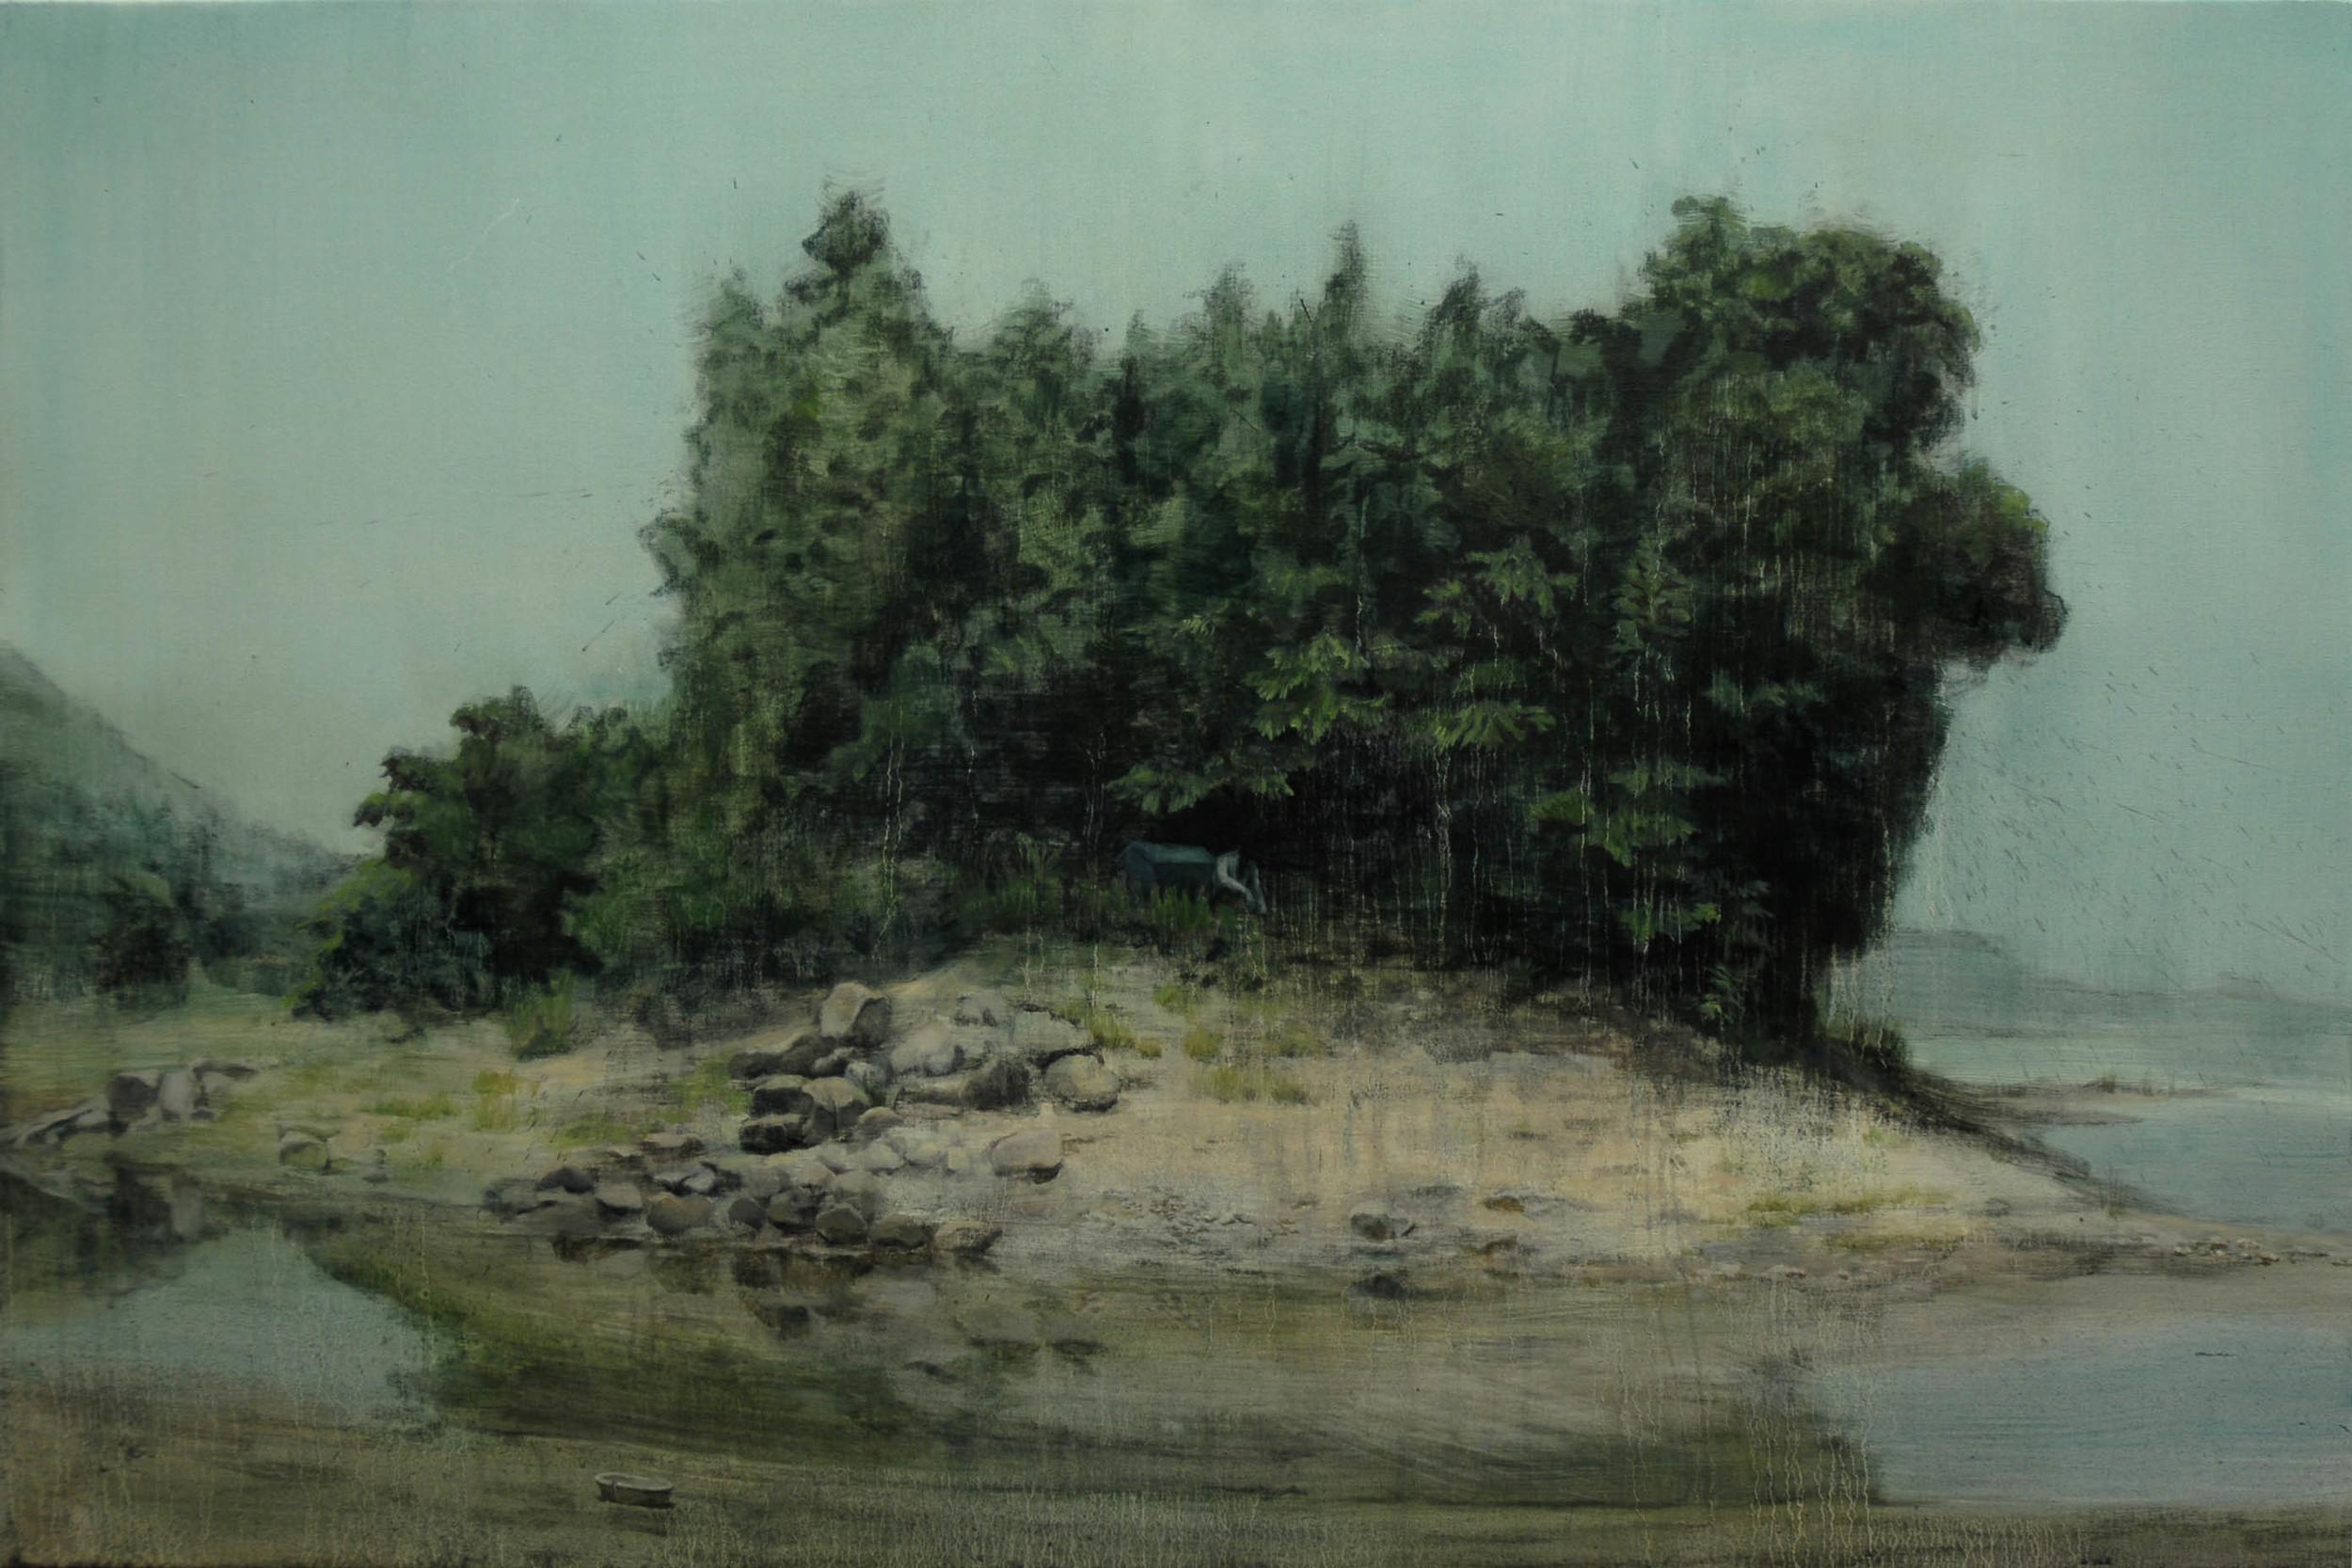 Lu Song 吕松, Sense of Security 安全感, 2011, Oil on canvas 布面油画, 100 x 150 cm